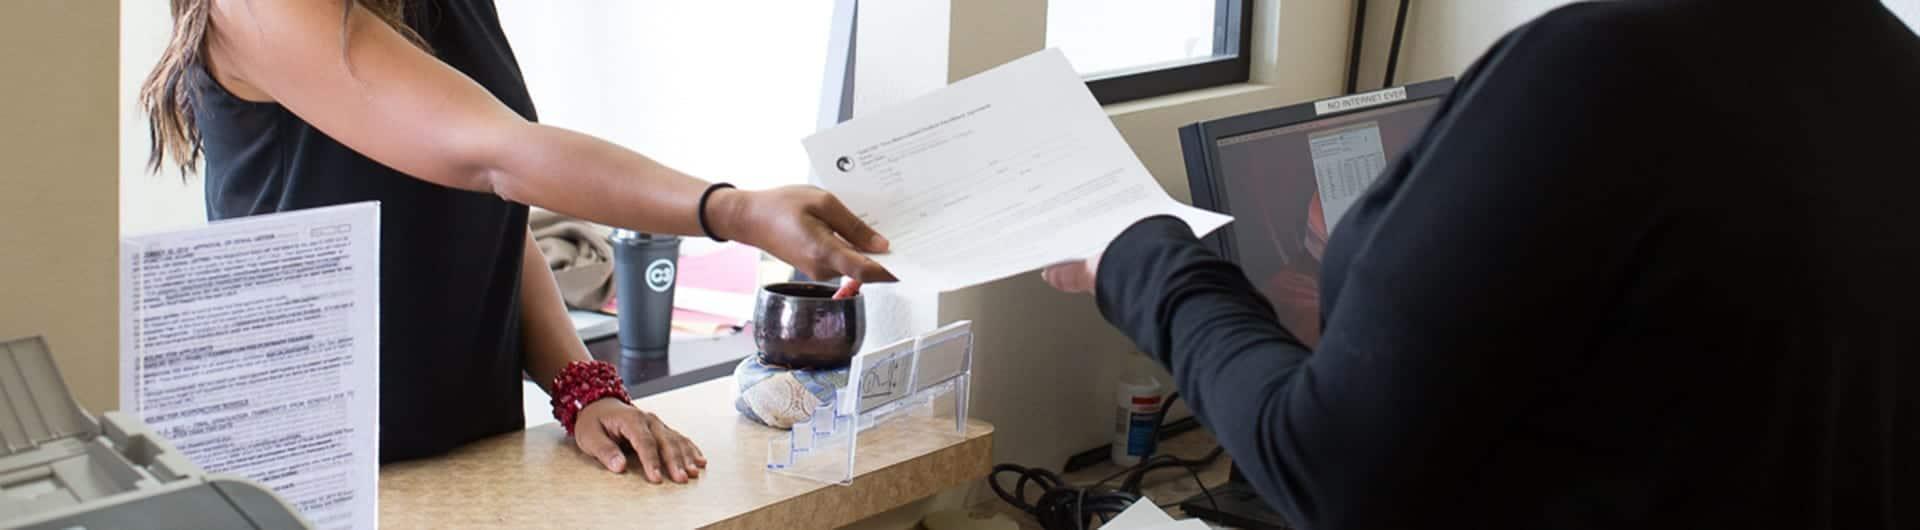 Student handing application to PCOM staff